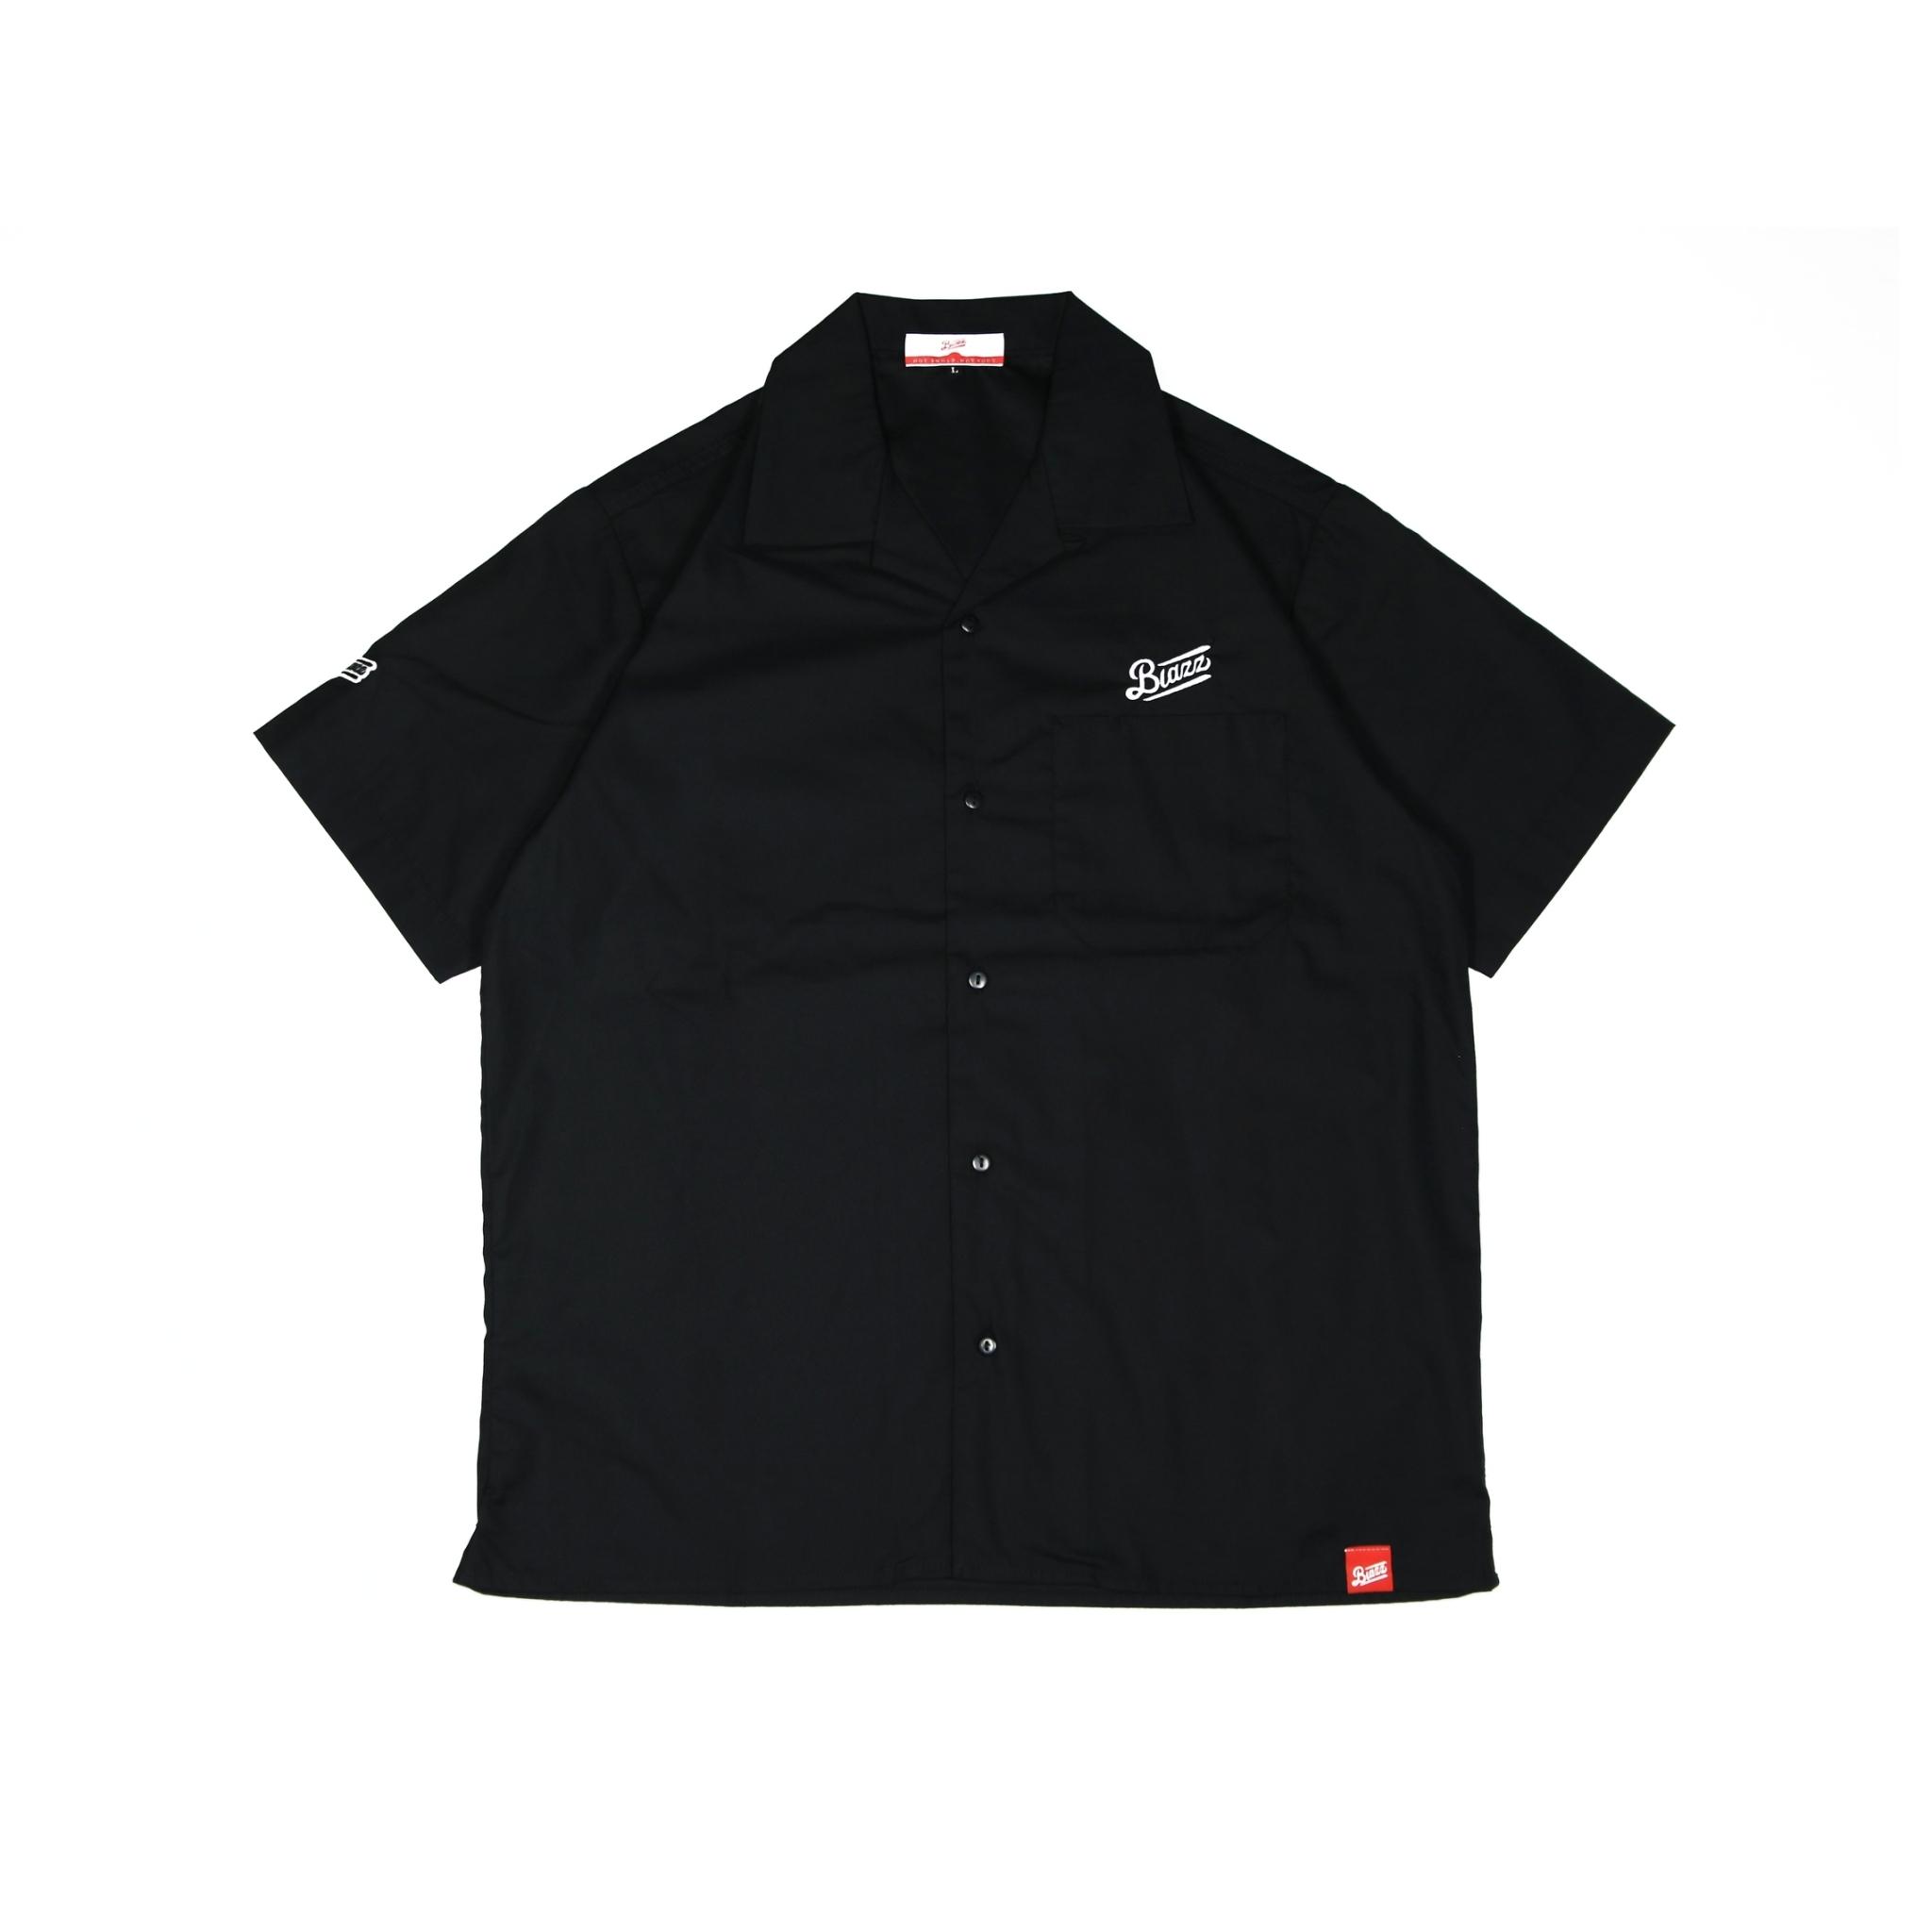 LOGO T/C OPEN SHIRT [BLACK]